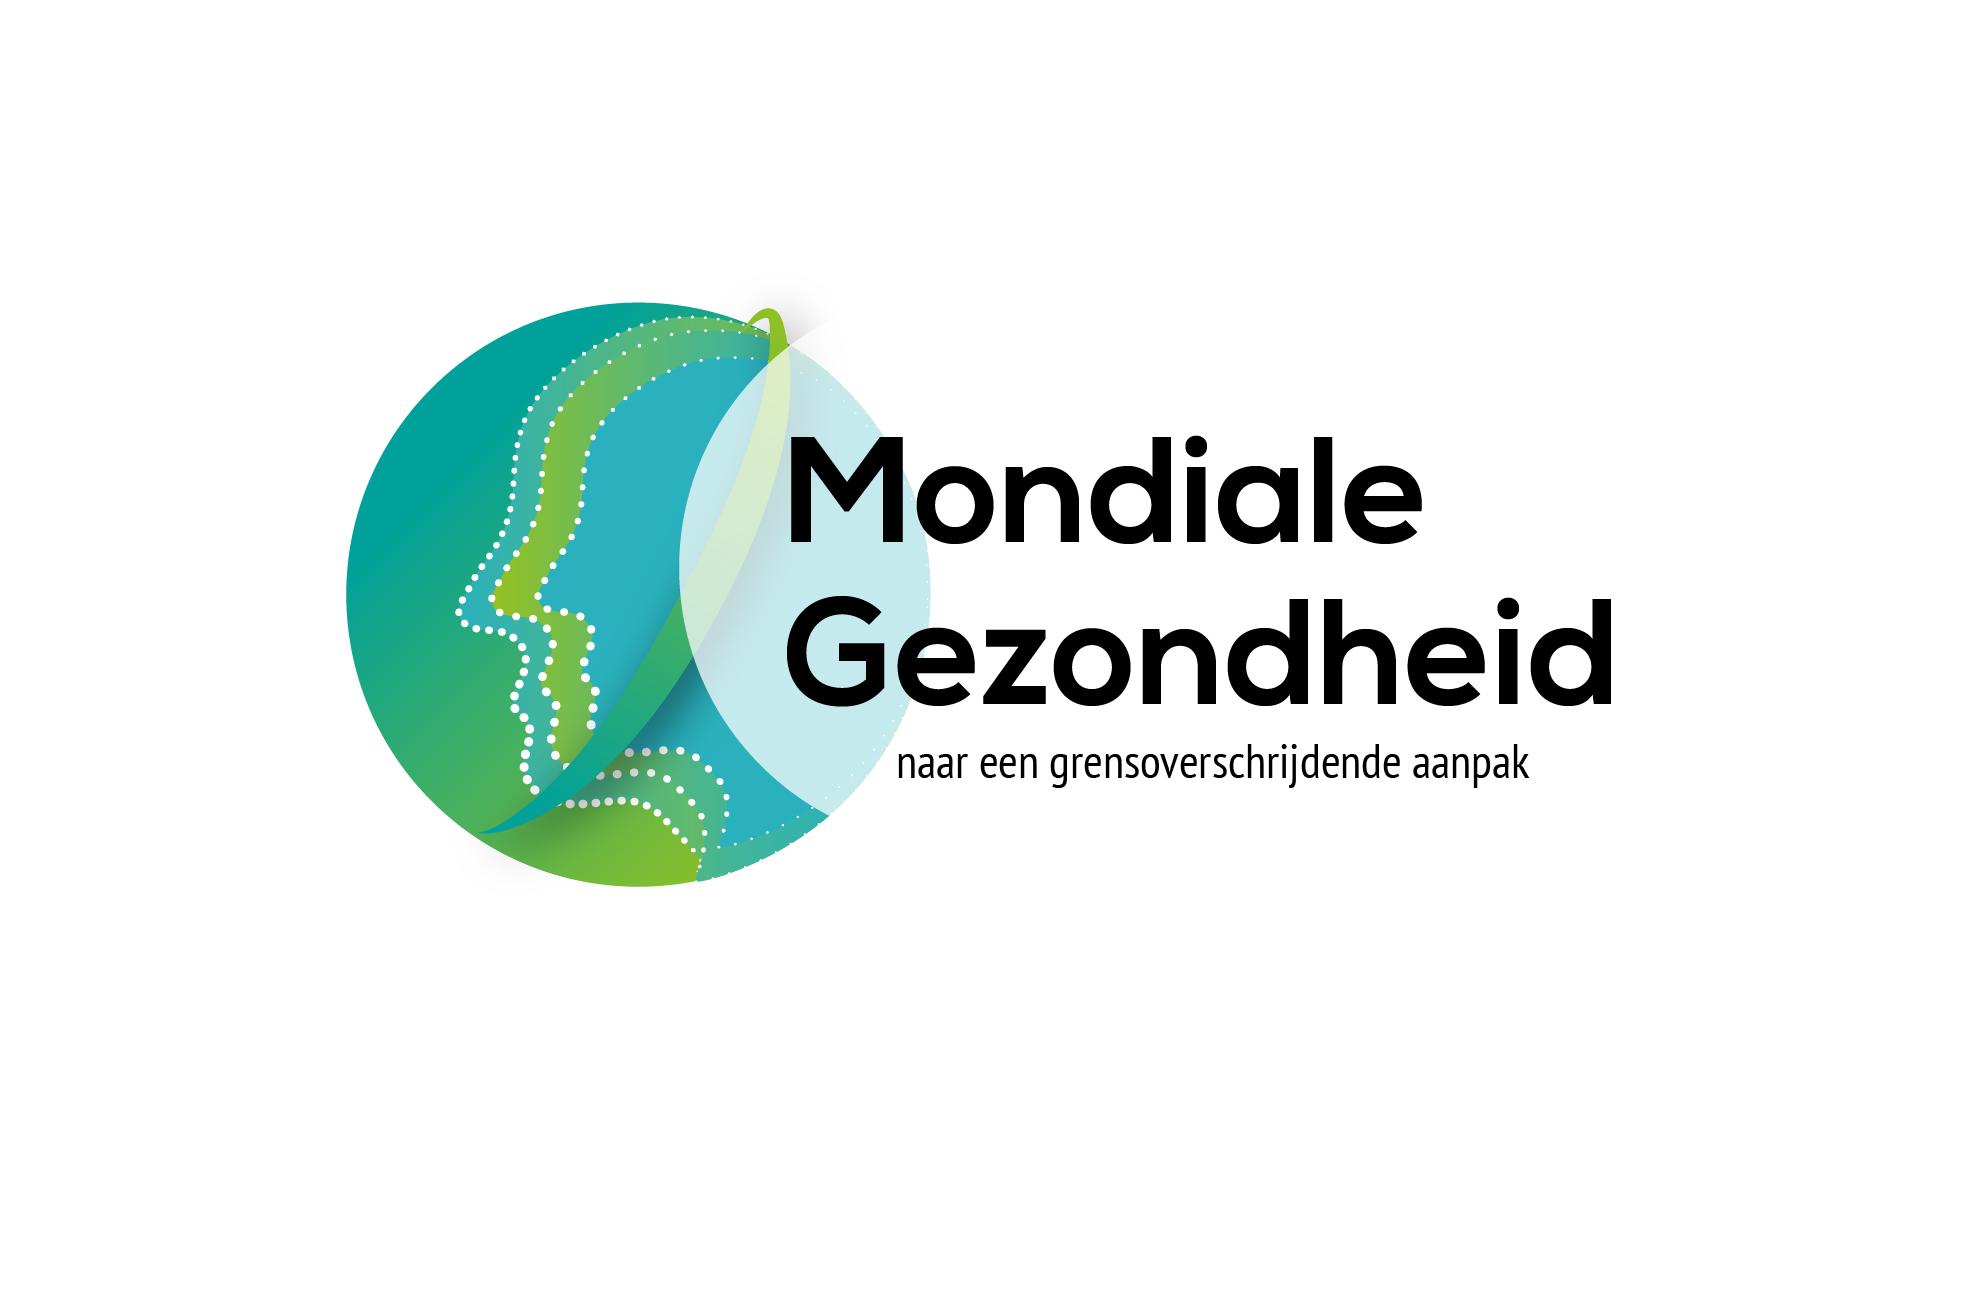 https://viceversaonline.nl/site/wp-content/uploads/2017/10/mondialegezondheid_v2-02.jpg